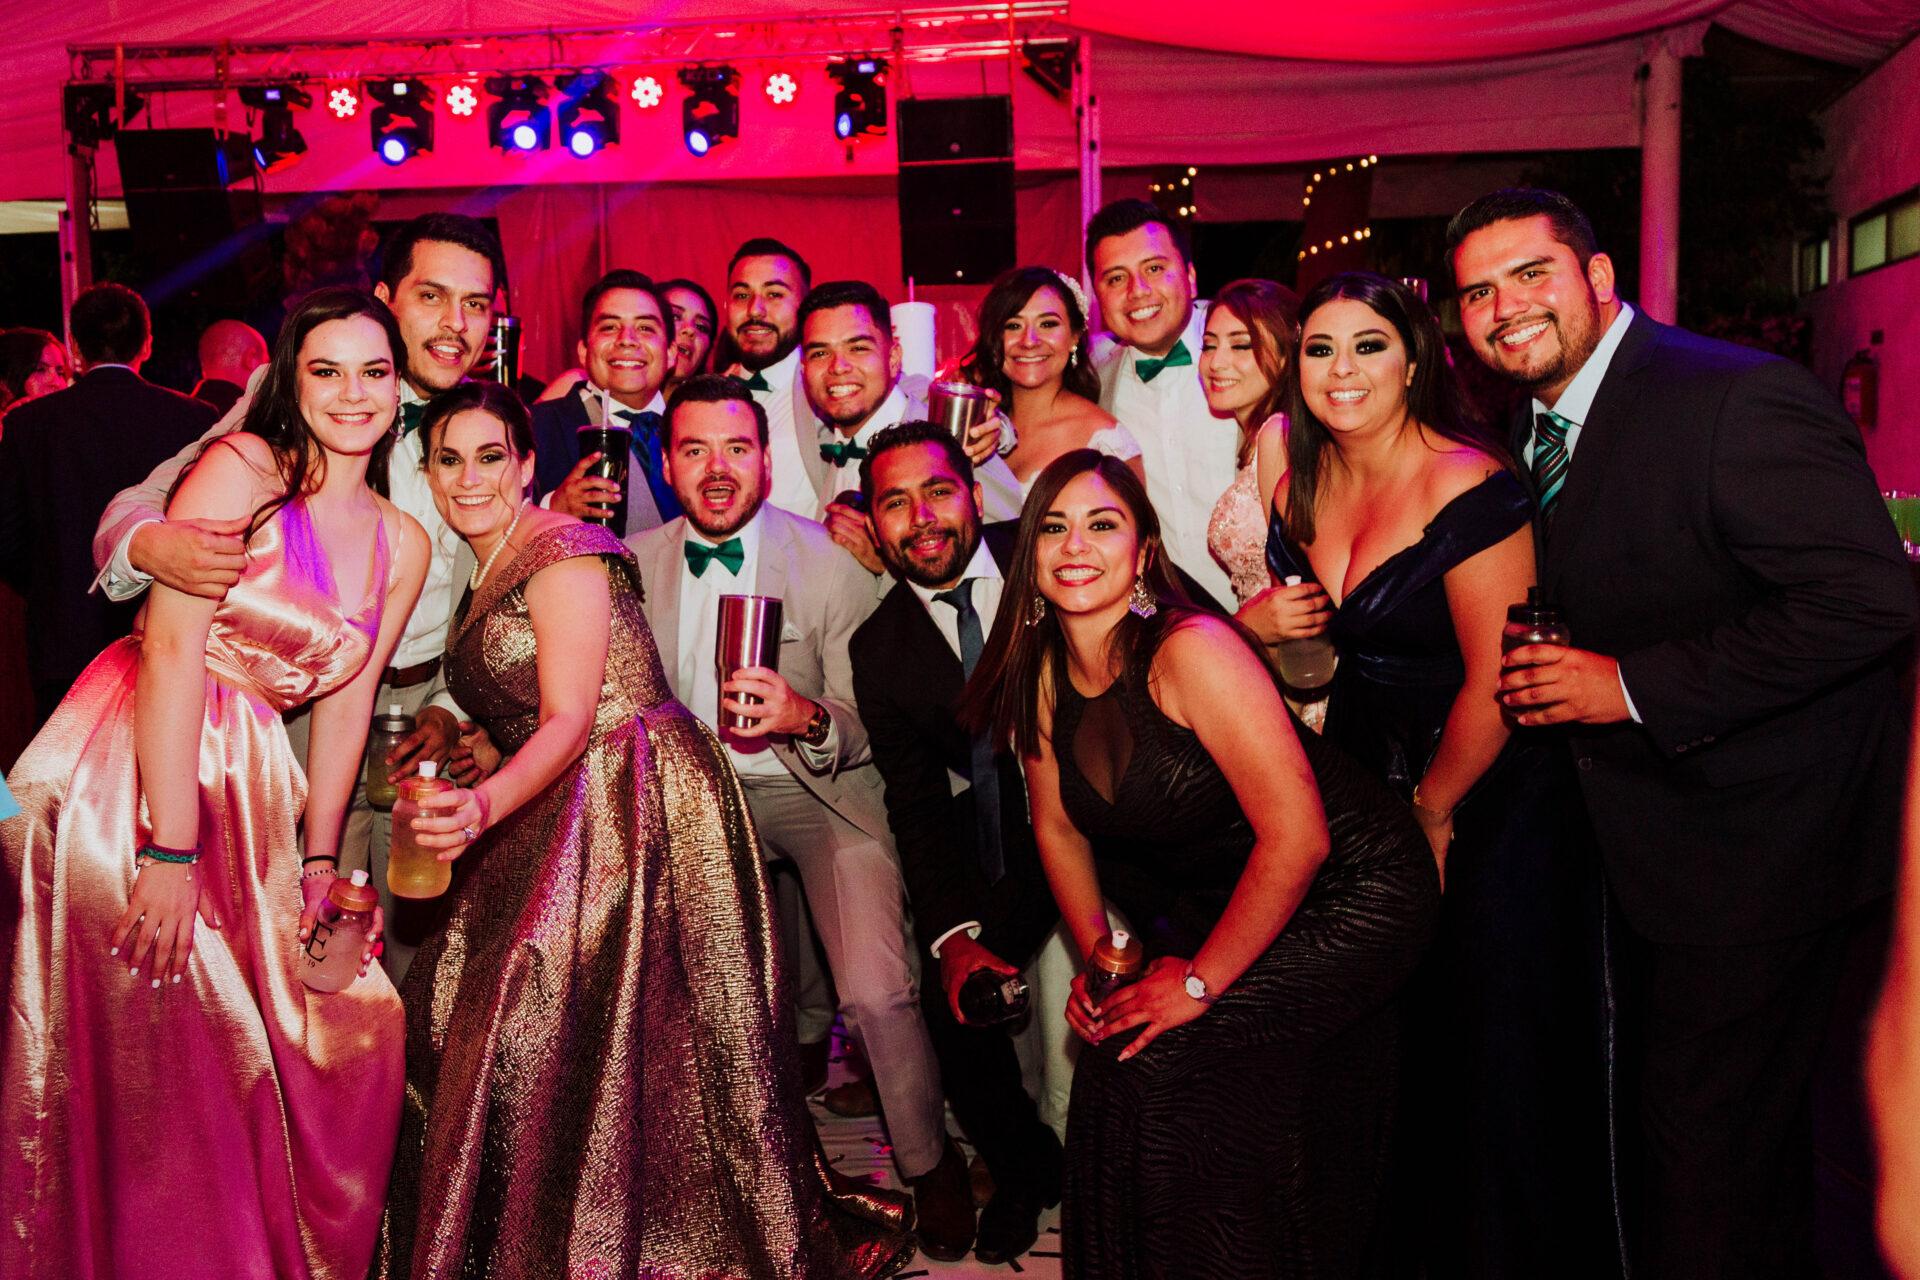 javier_noriega_fotografo_bodas_torreon_coahuila_zacatecas_wedding_photographer58a